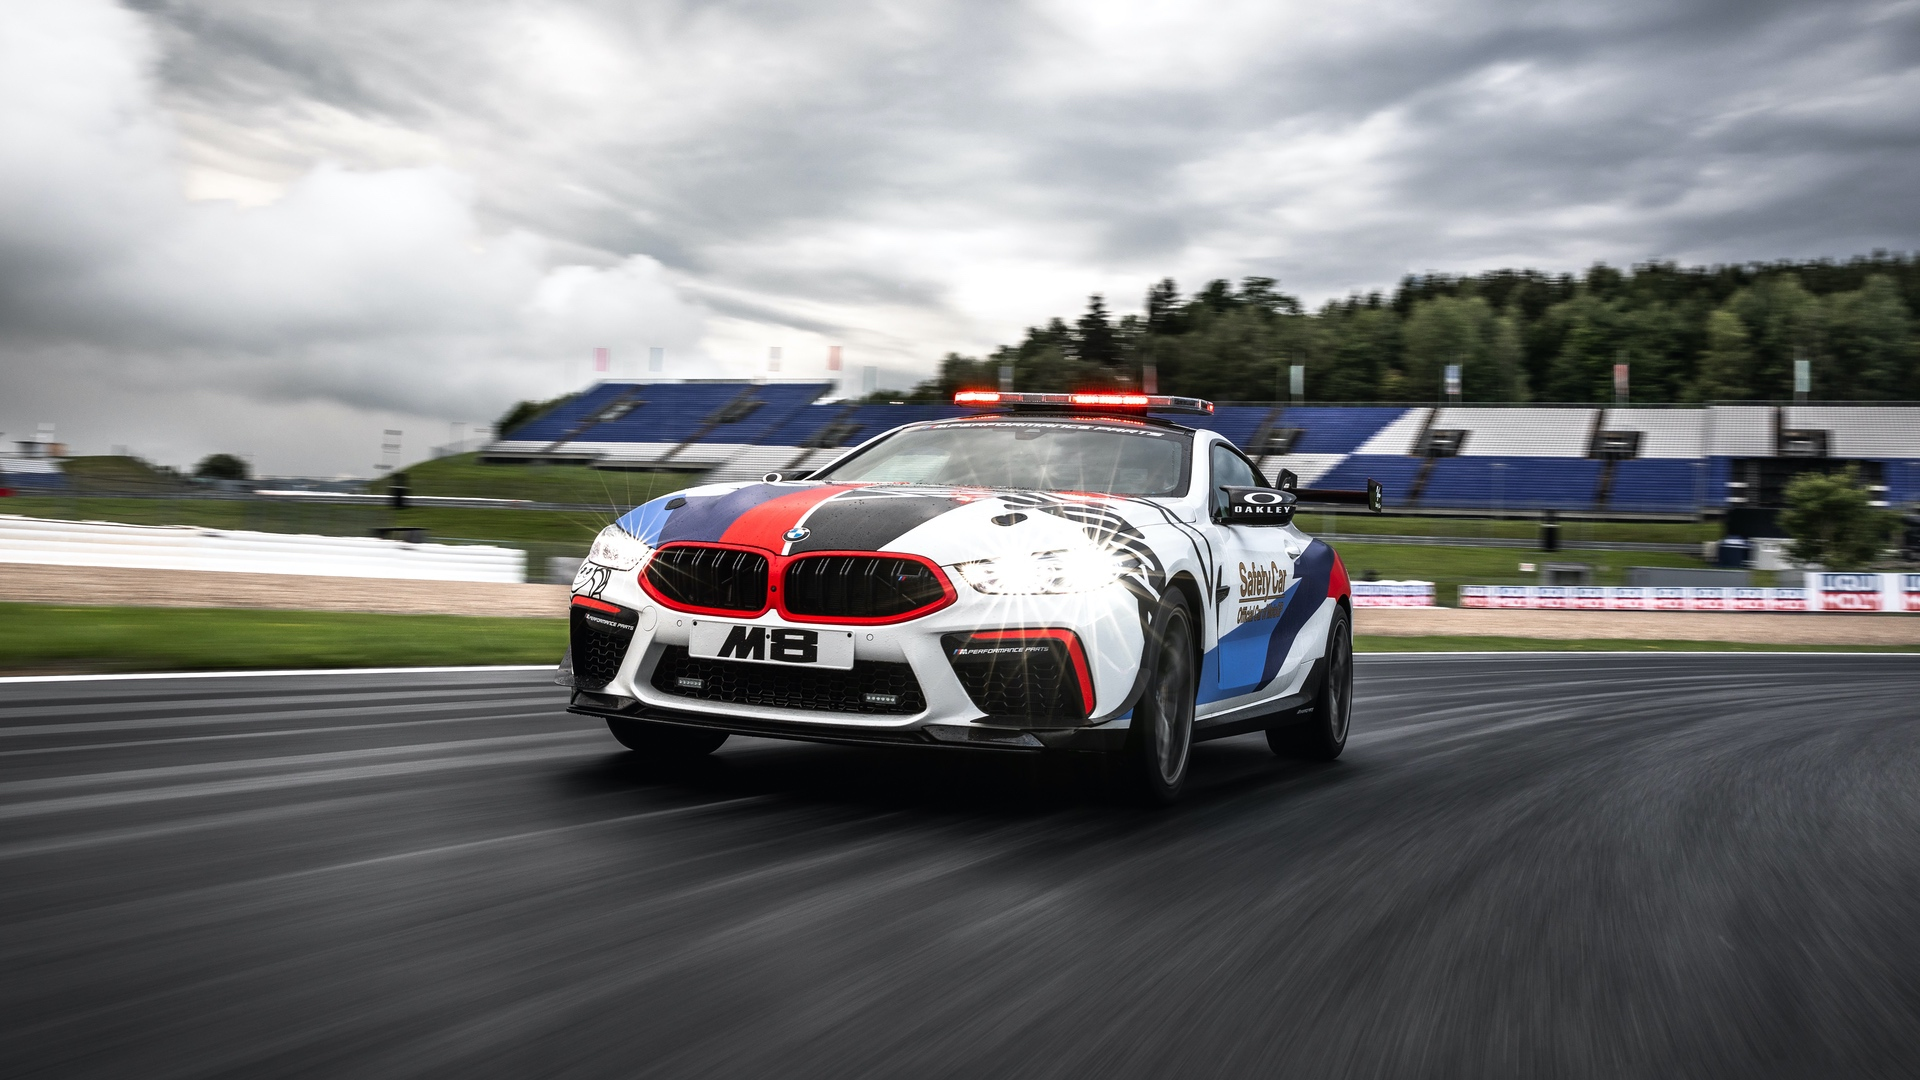 BMW_M8_MotoGP_Safety_Car_0027